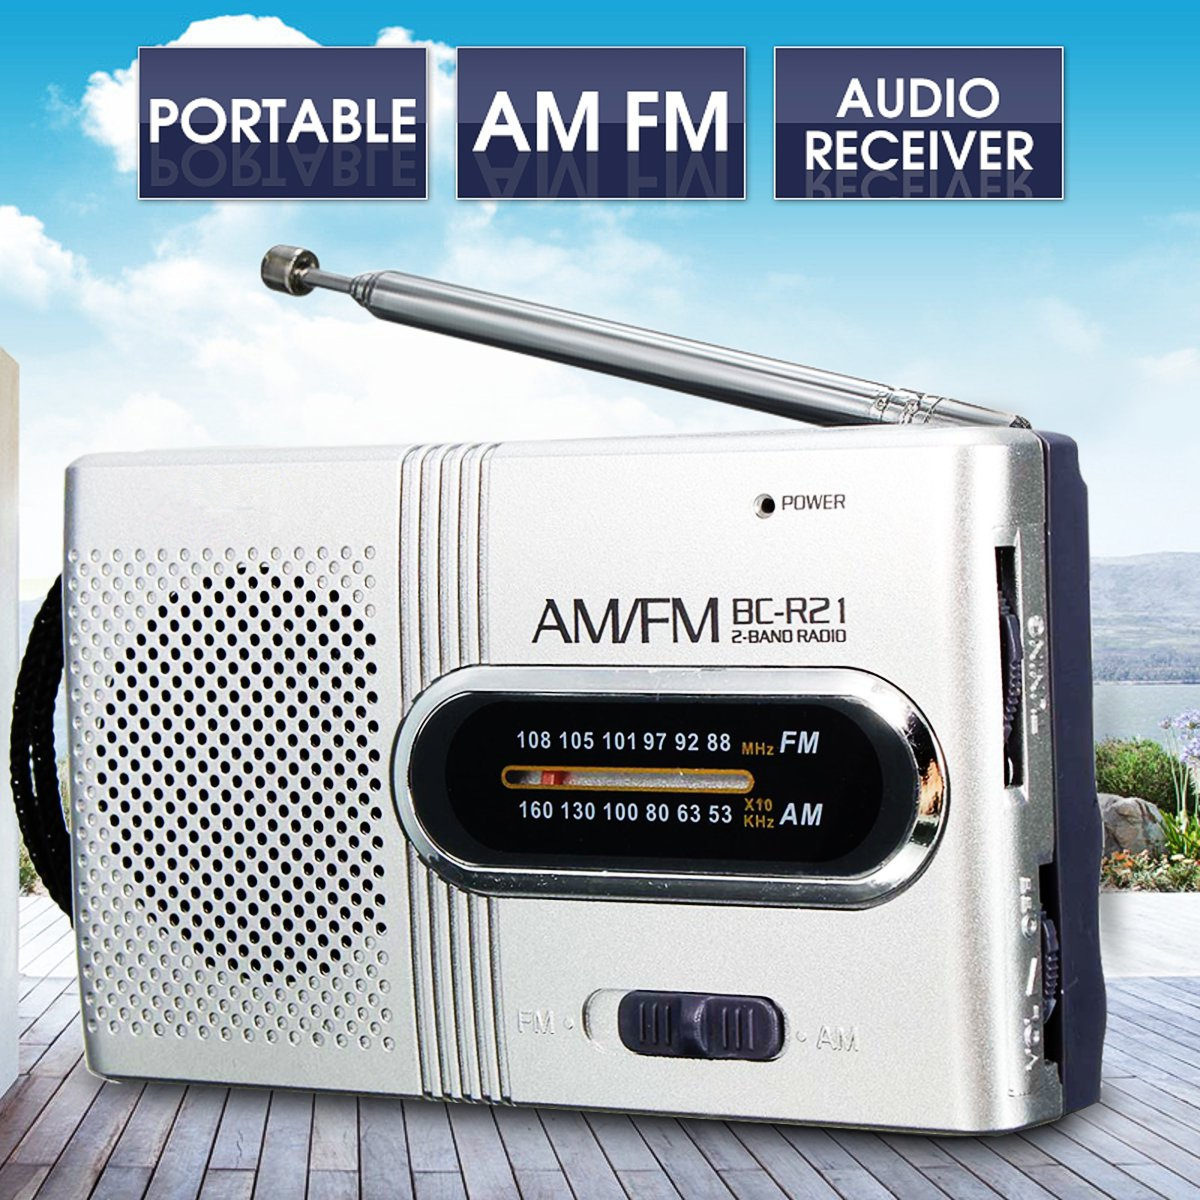 Pequeño portátil AM FM antena telescópica radio mundo receptor altavoz mini Radio FM radio radios